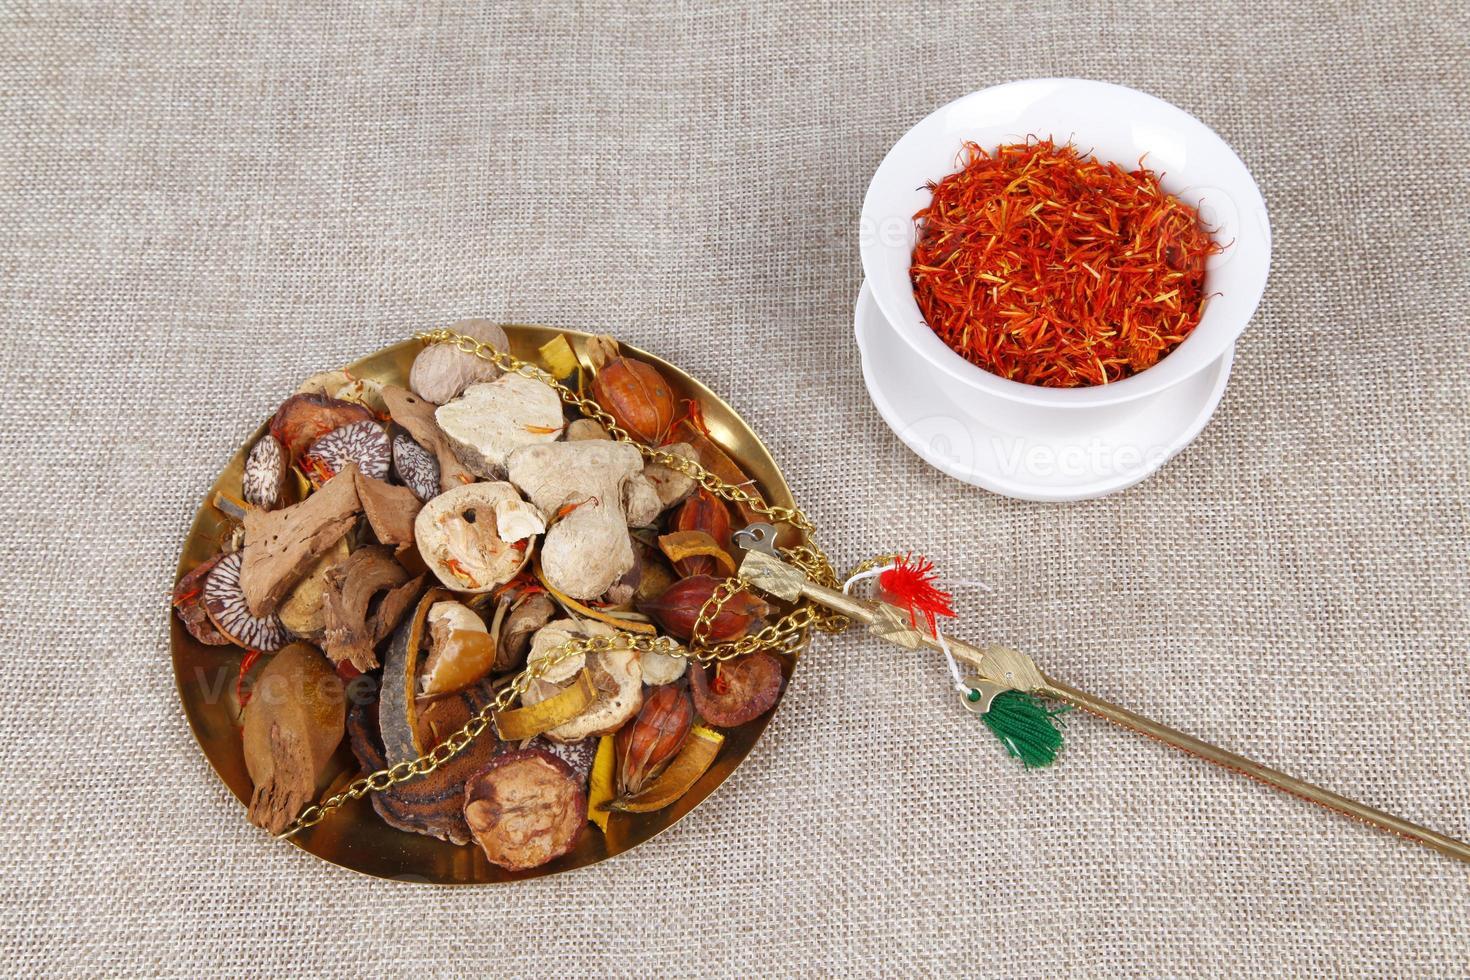 traditionelle chinesische Medizin (tcm), Nahaufnahme foto